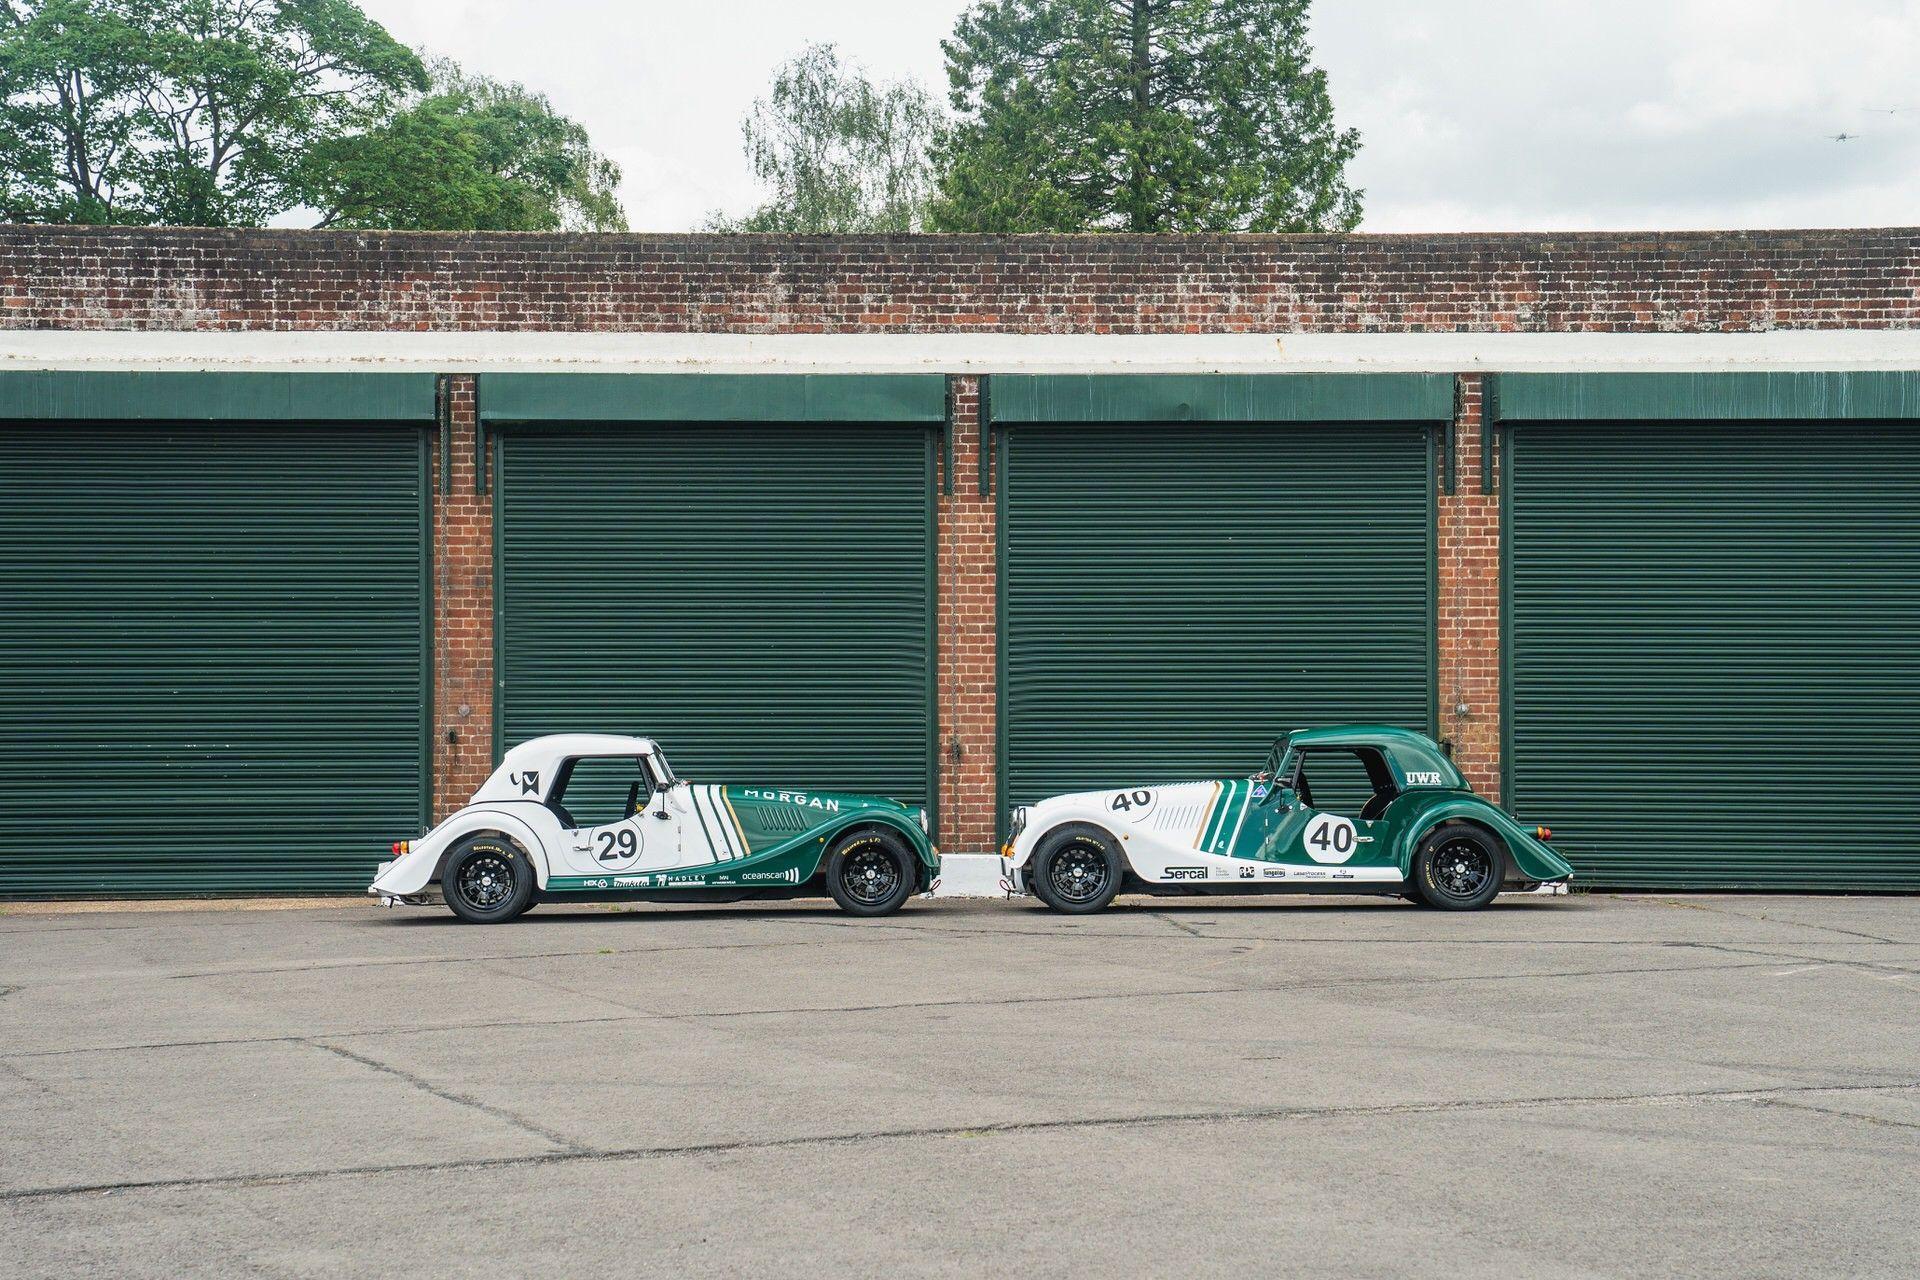 Morgan_Plus_Four_race_cars-0017